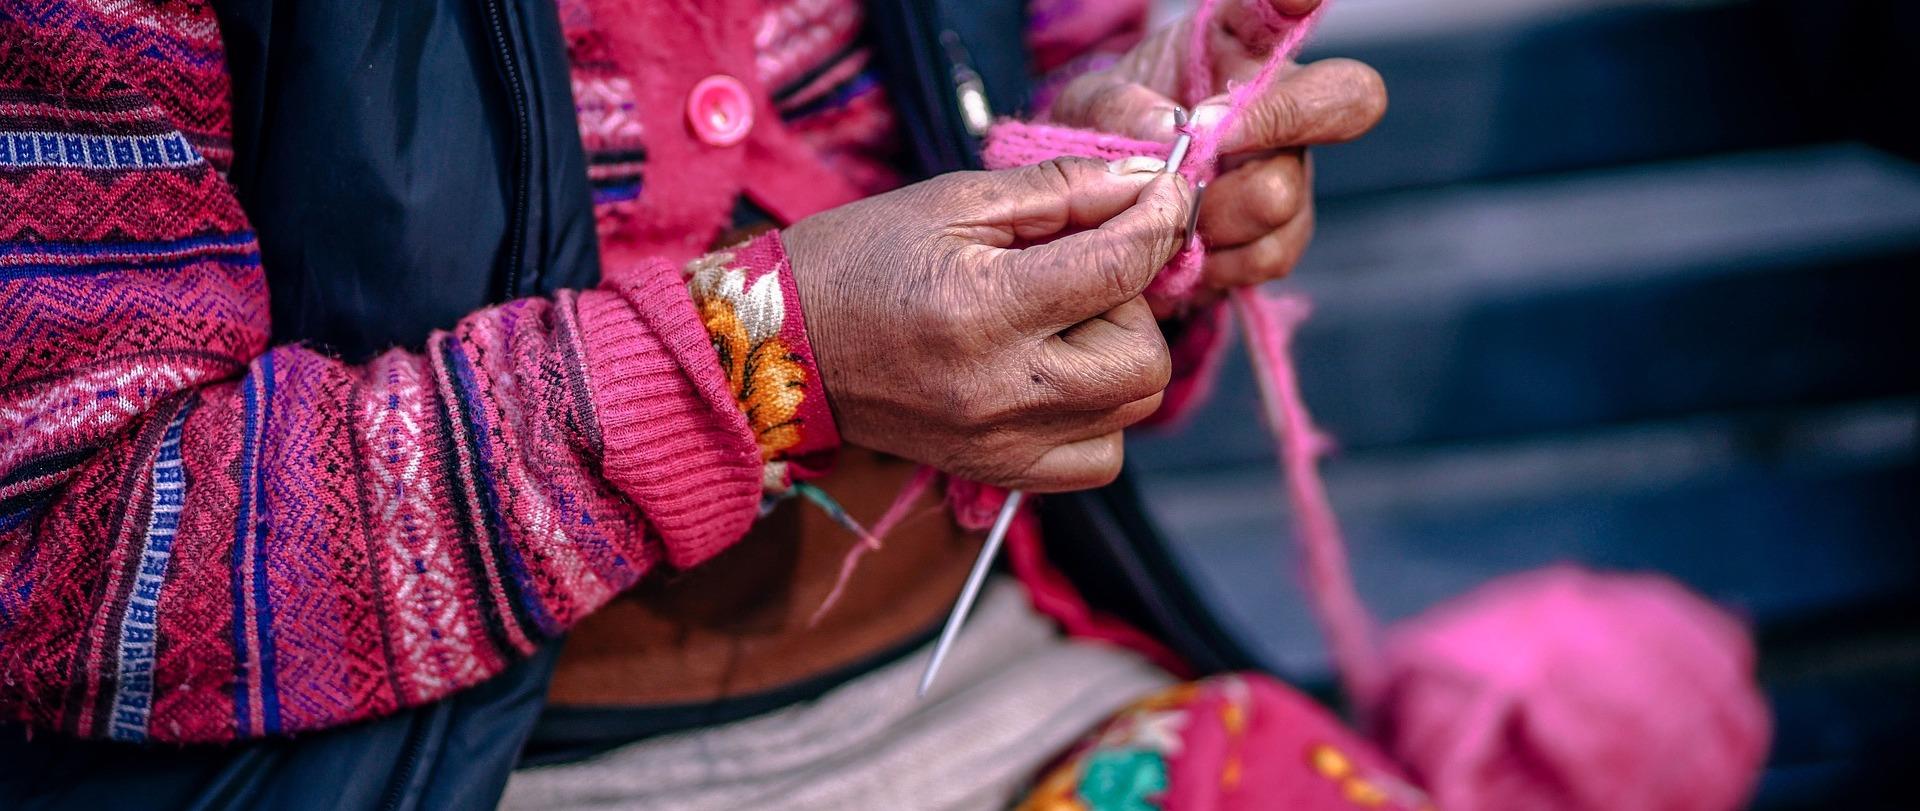 Woman's yarn